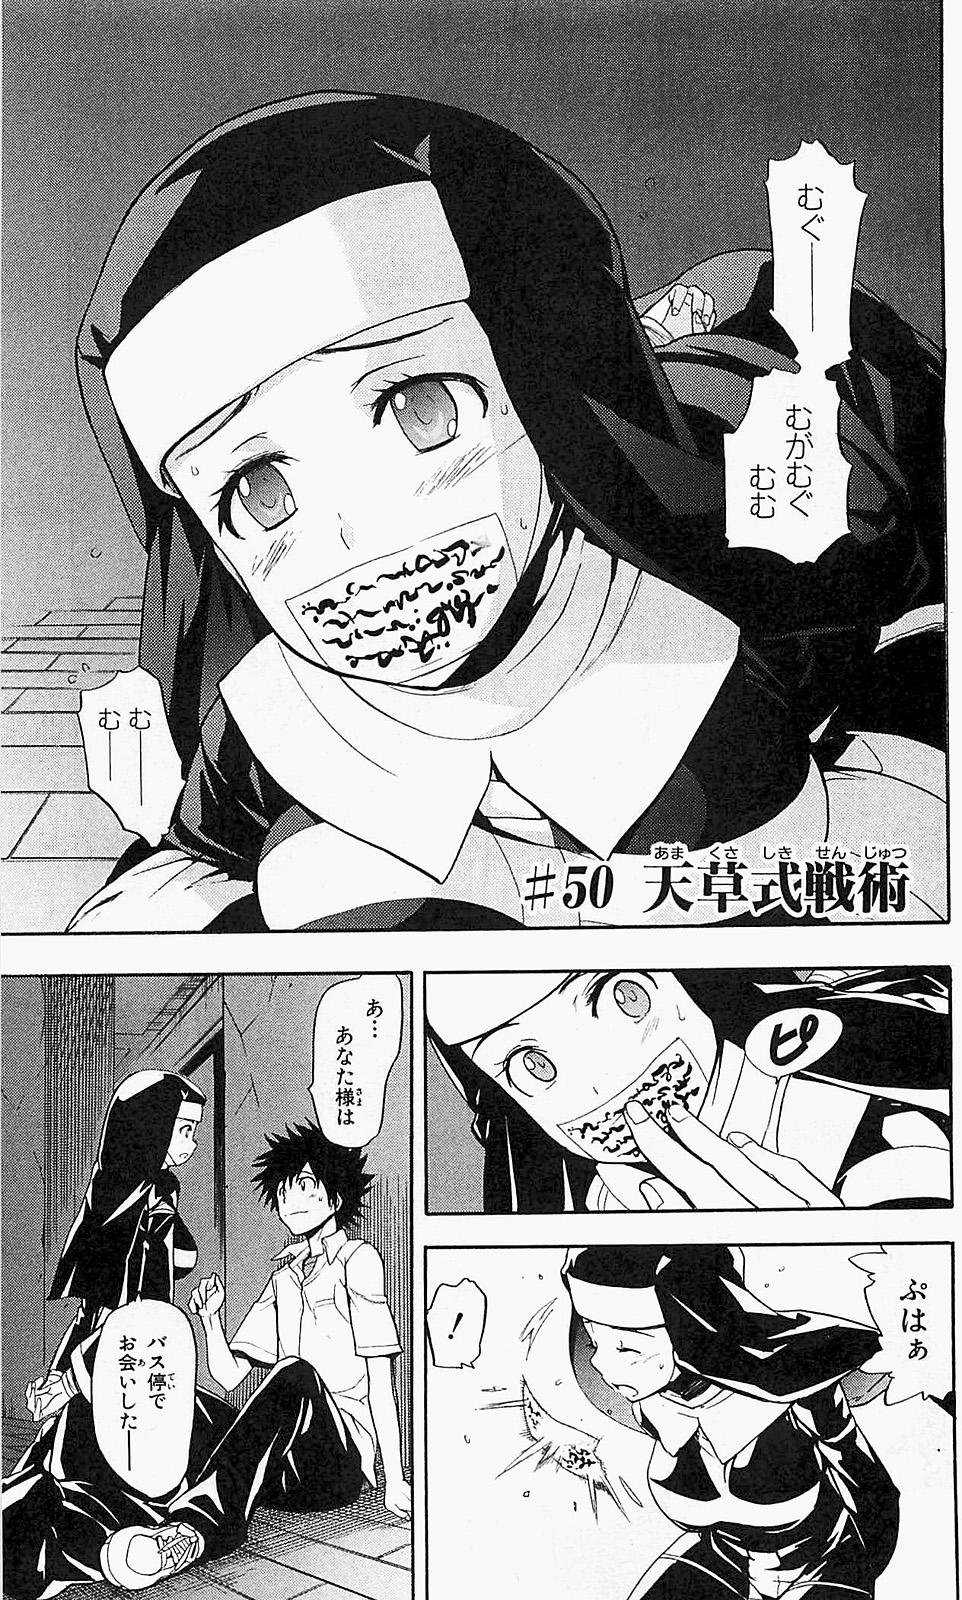 toaru majutsu no index manga chapter 050